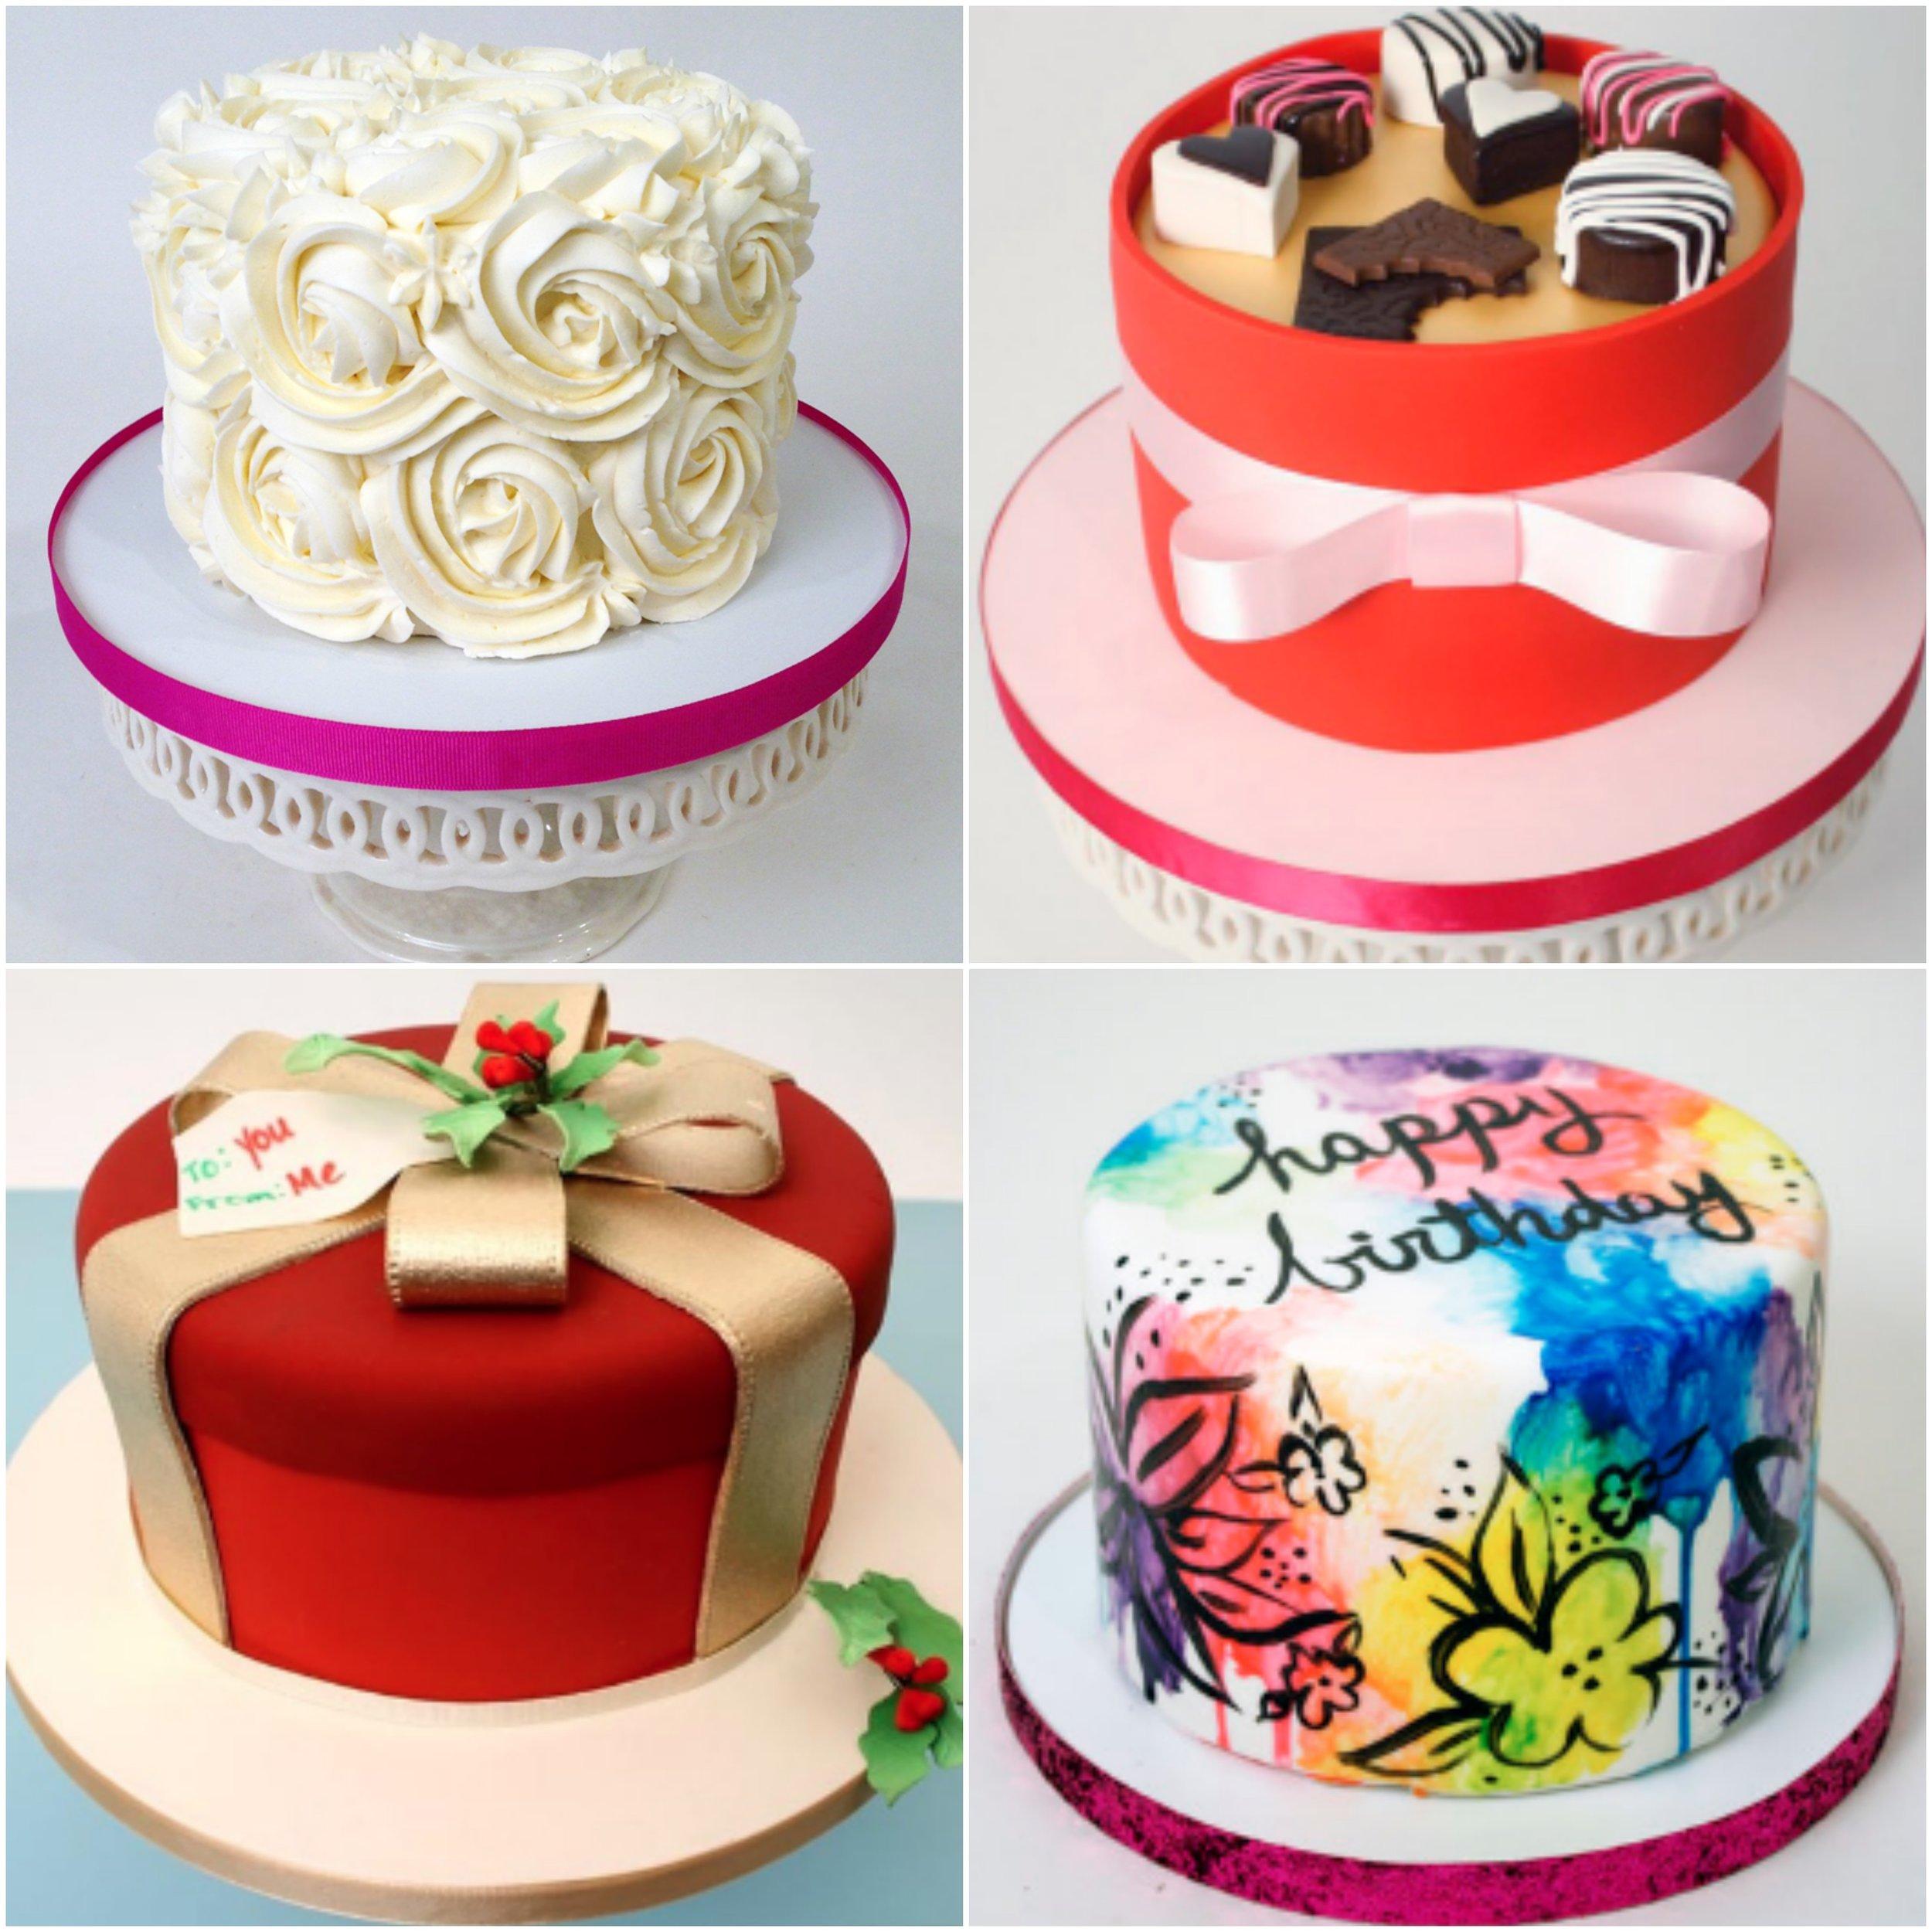 lil cakes.jpg